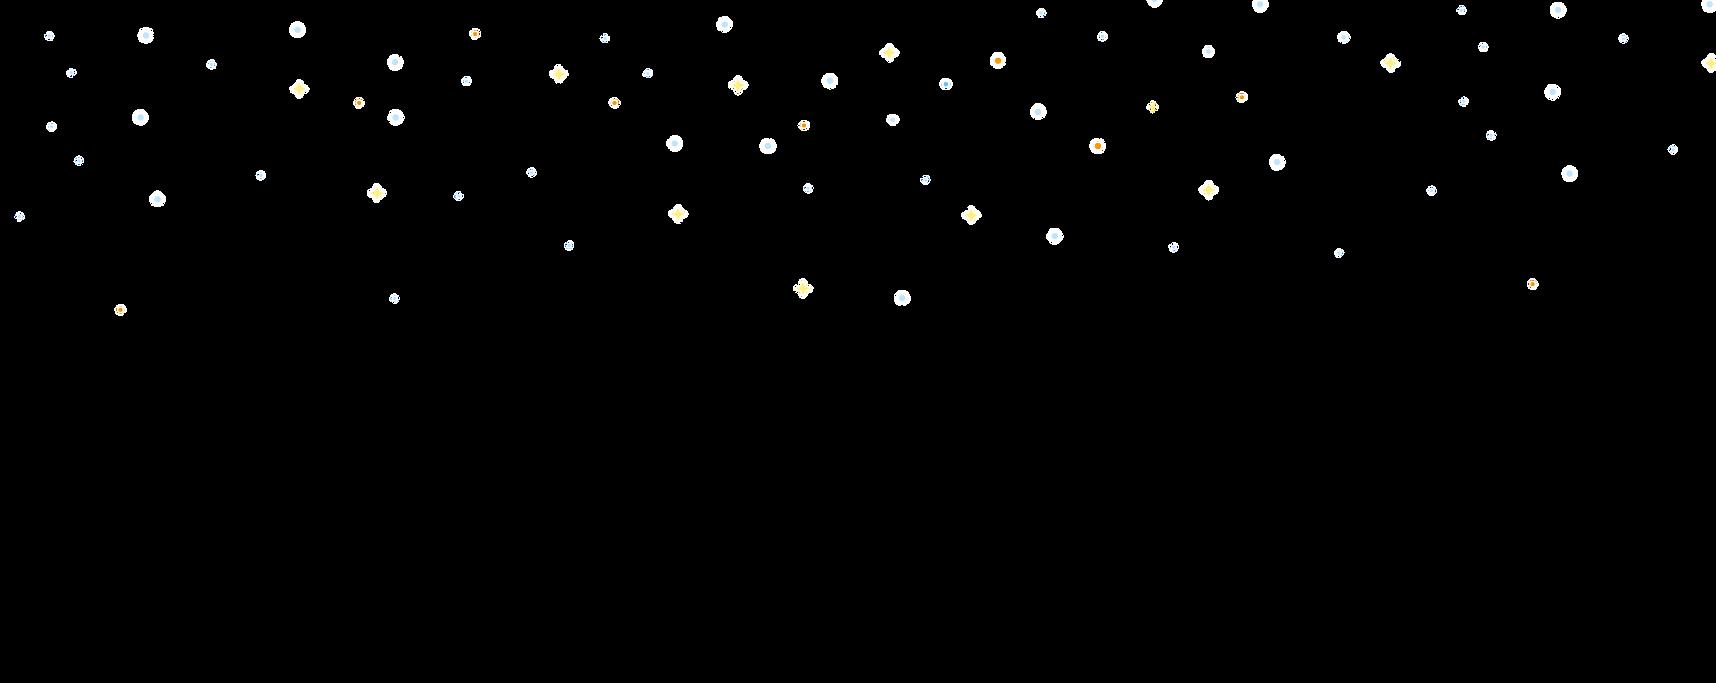 kukua_section_stars.png